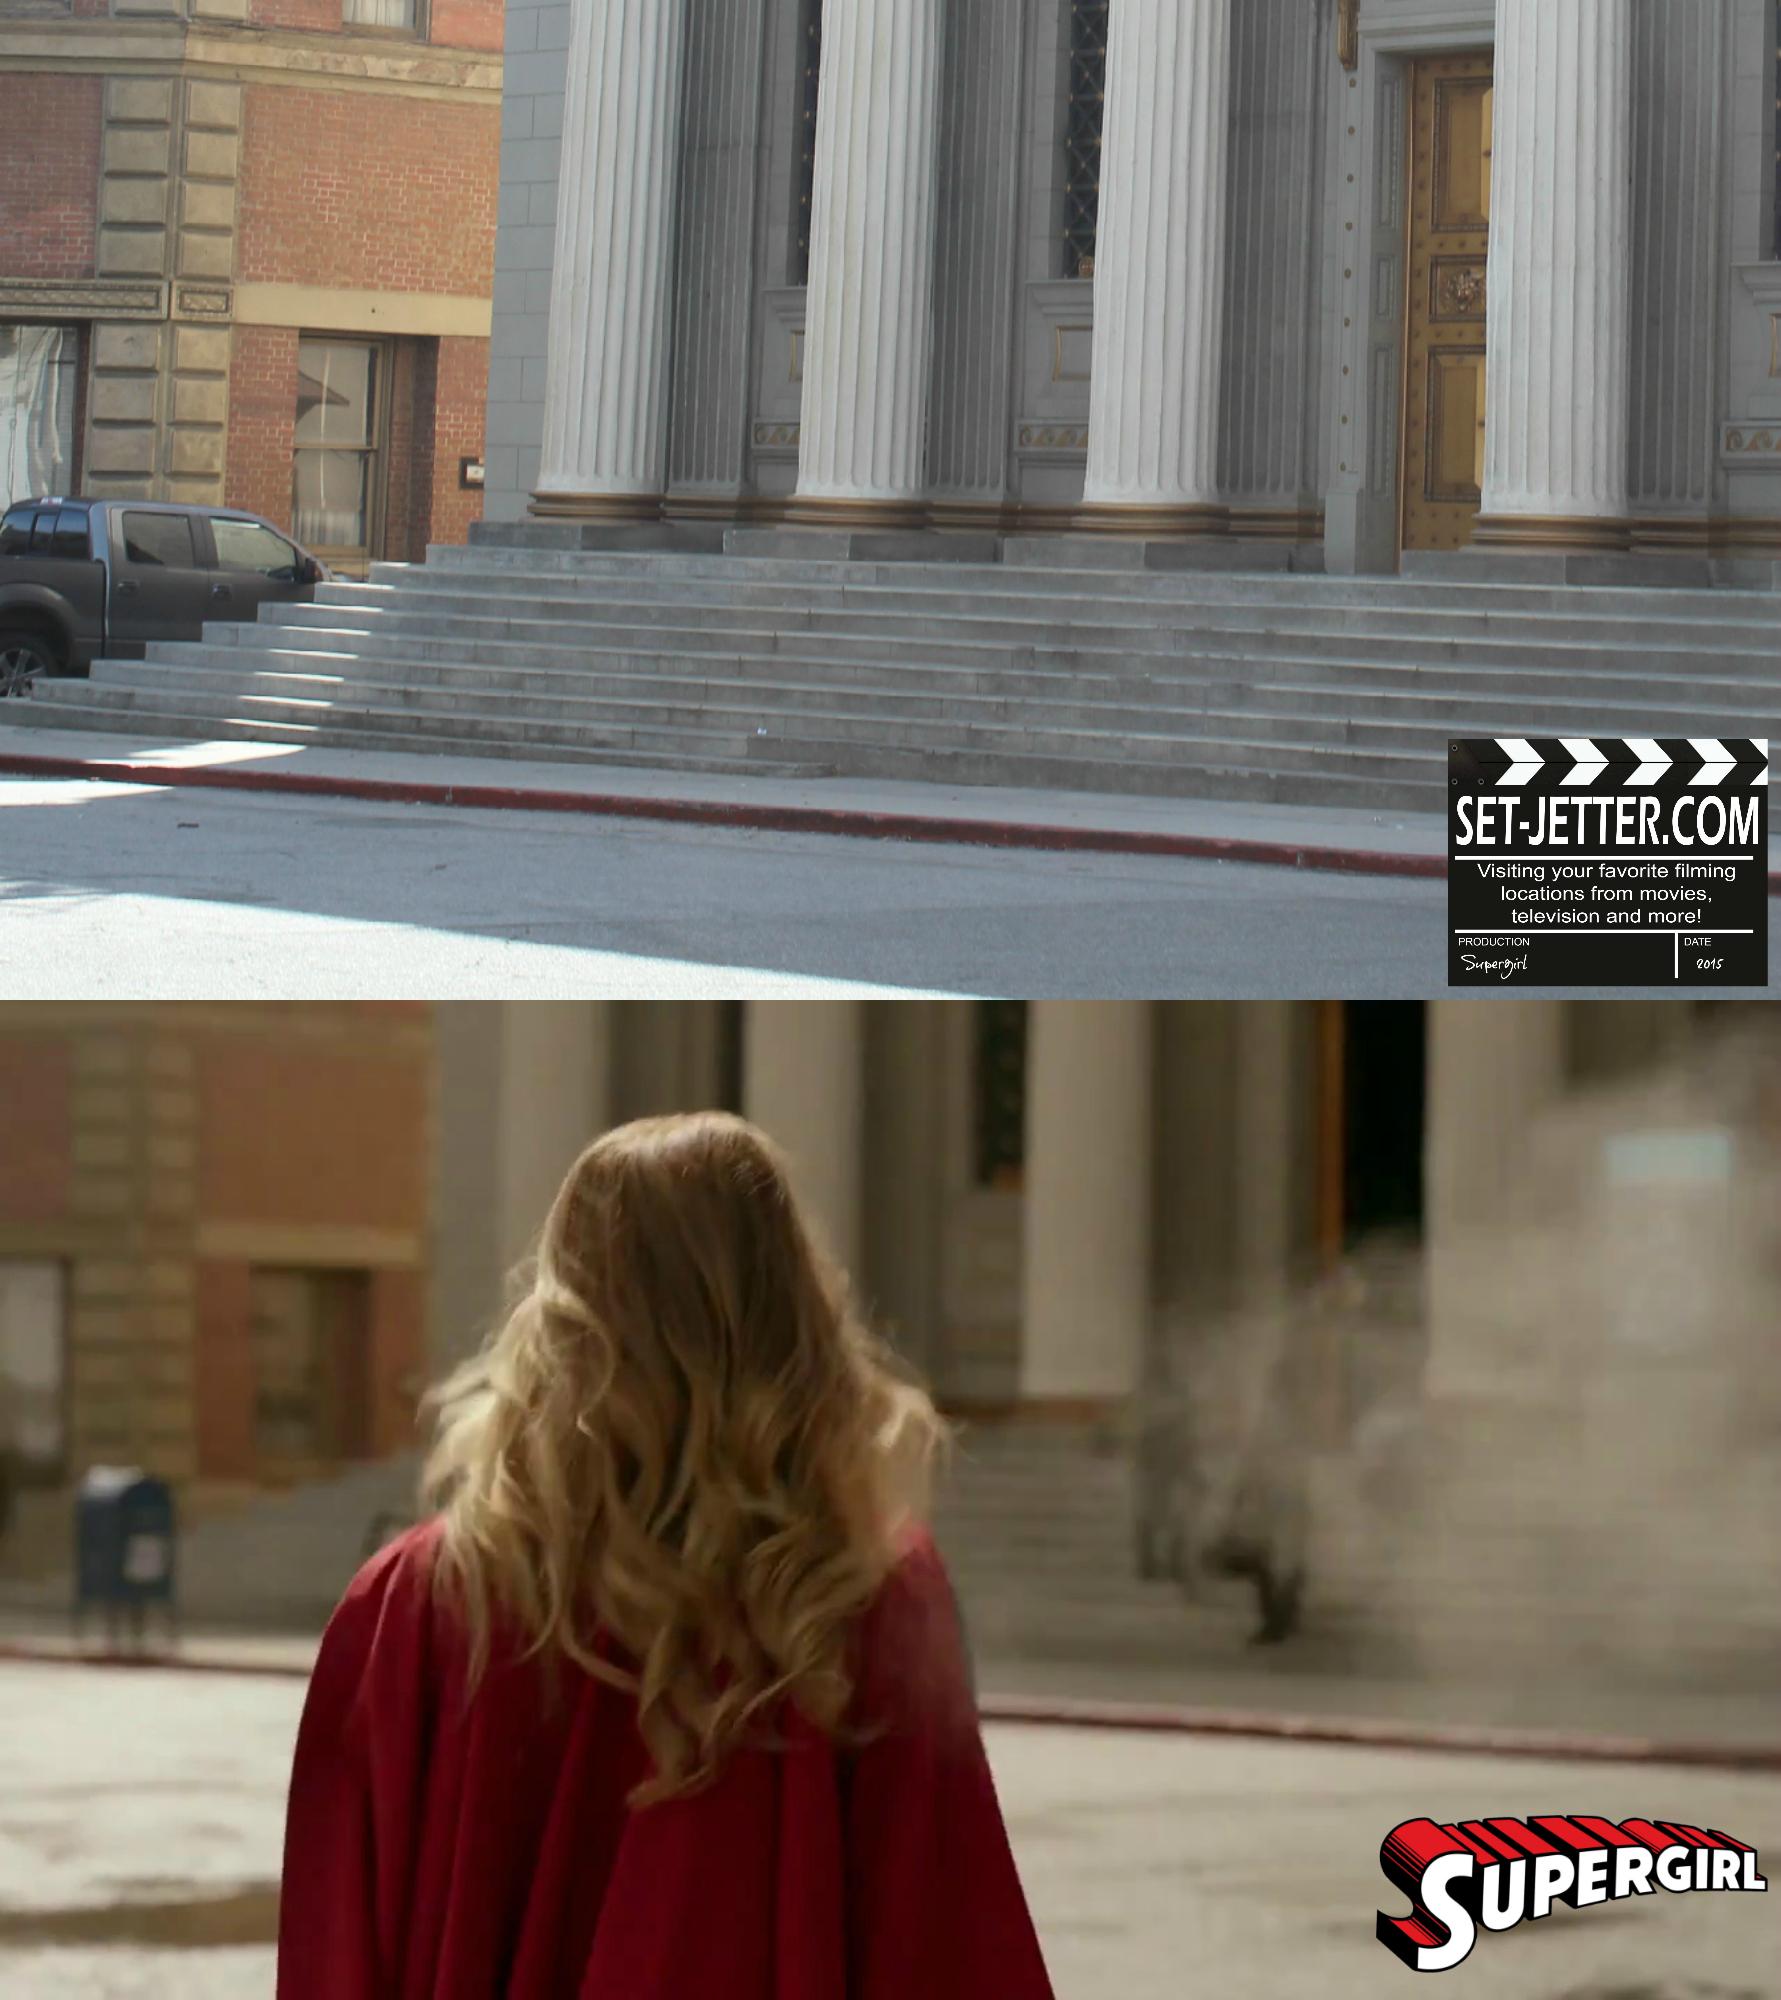 Supergirl comparison 22.jpg